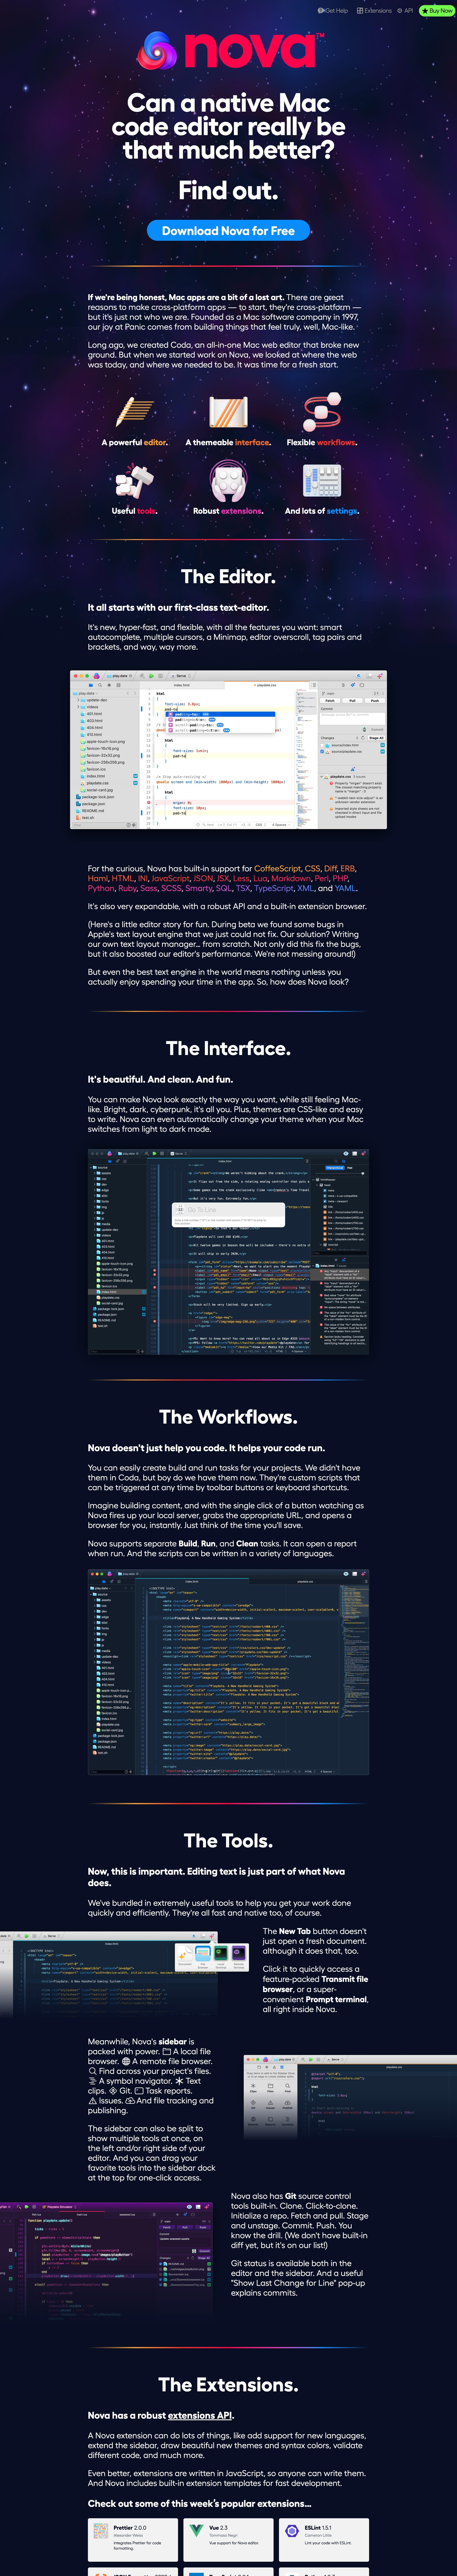 Nova Website Screenshot